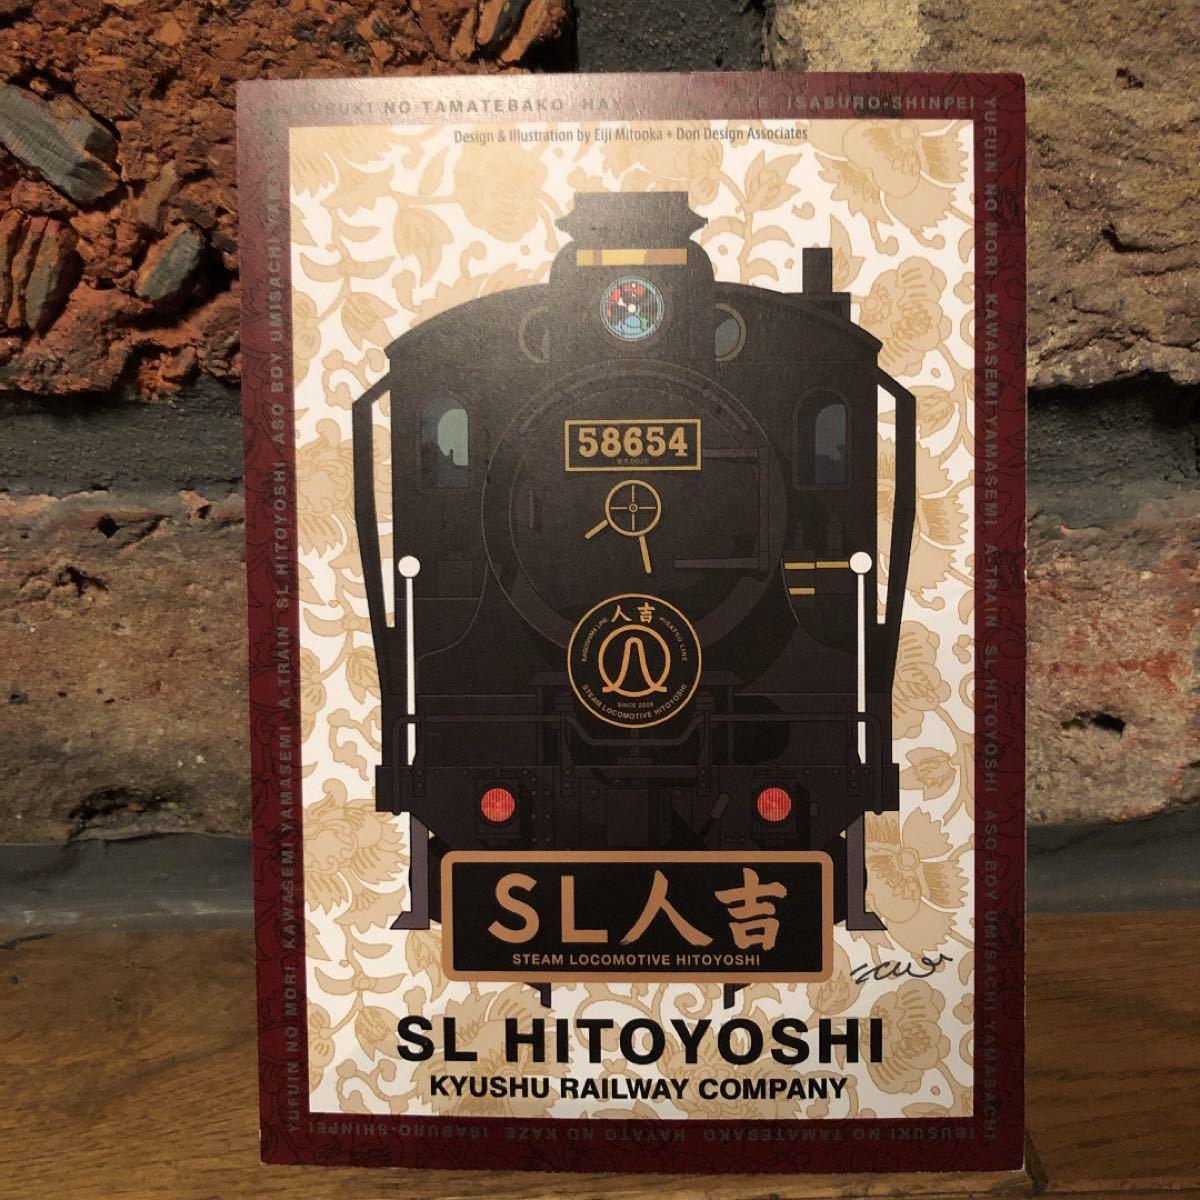 SL鬼滅の刃 使用済み切符(指定券)&記念乗車証